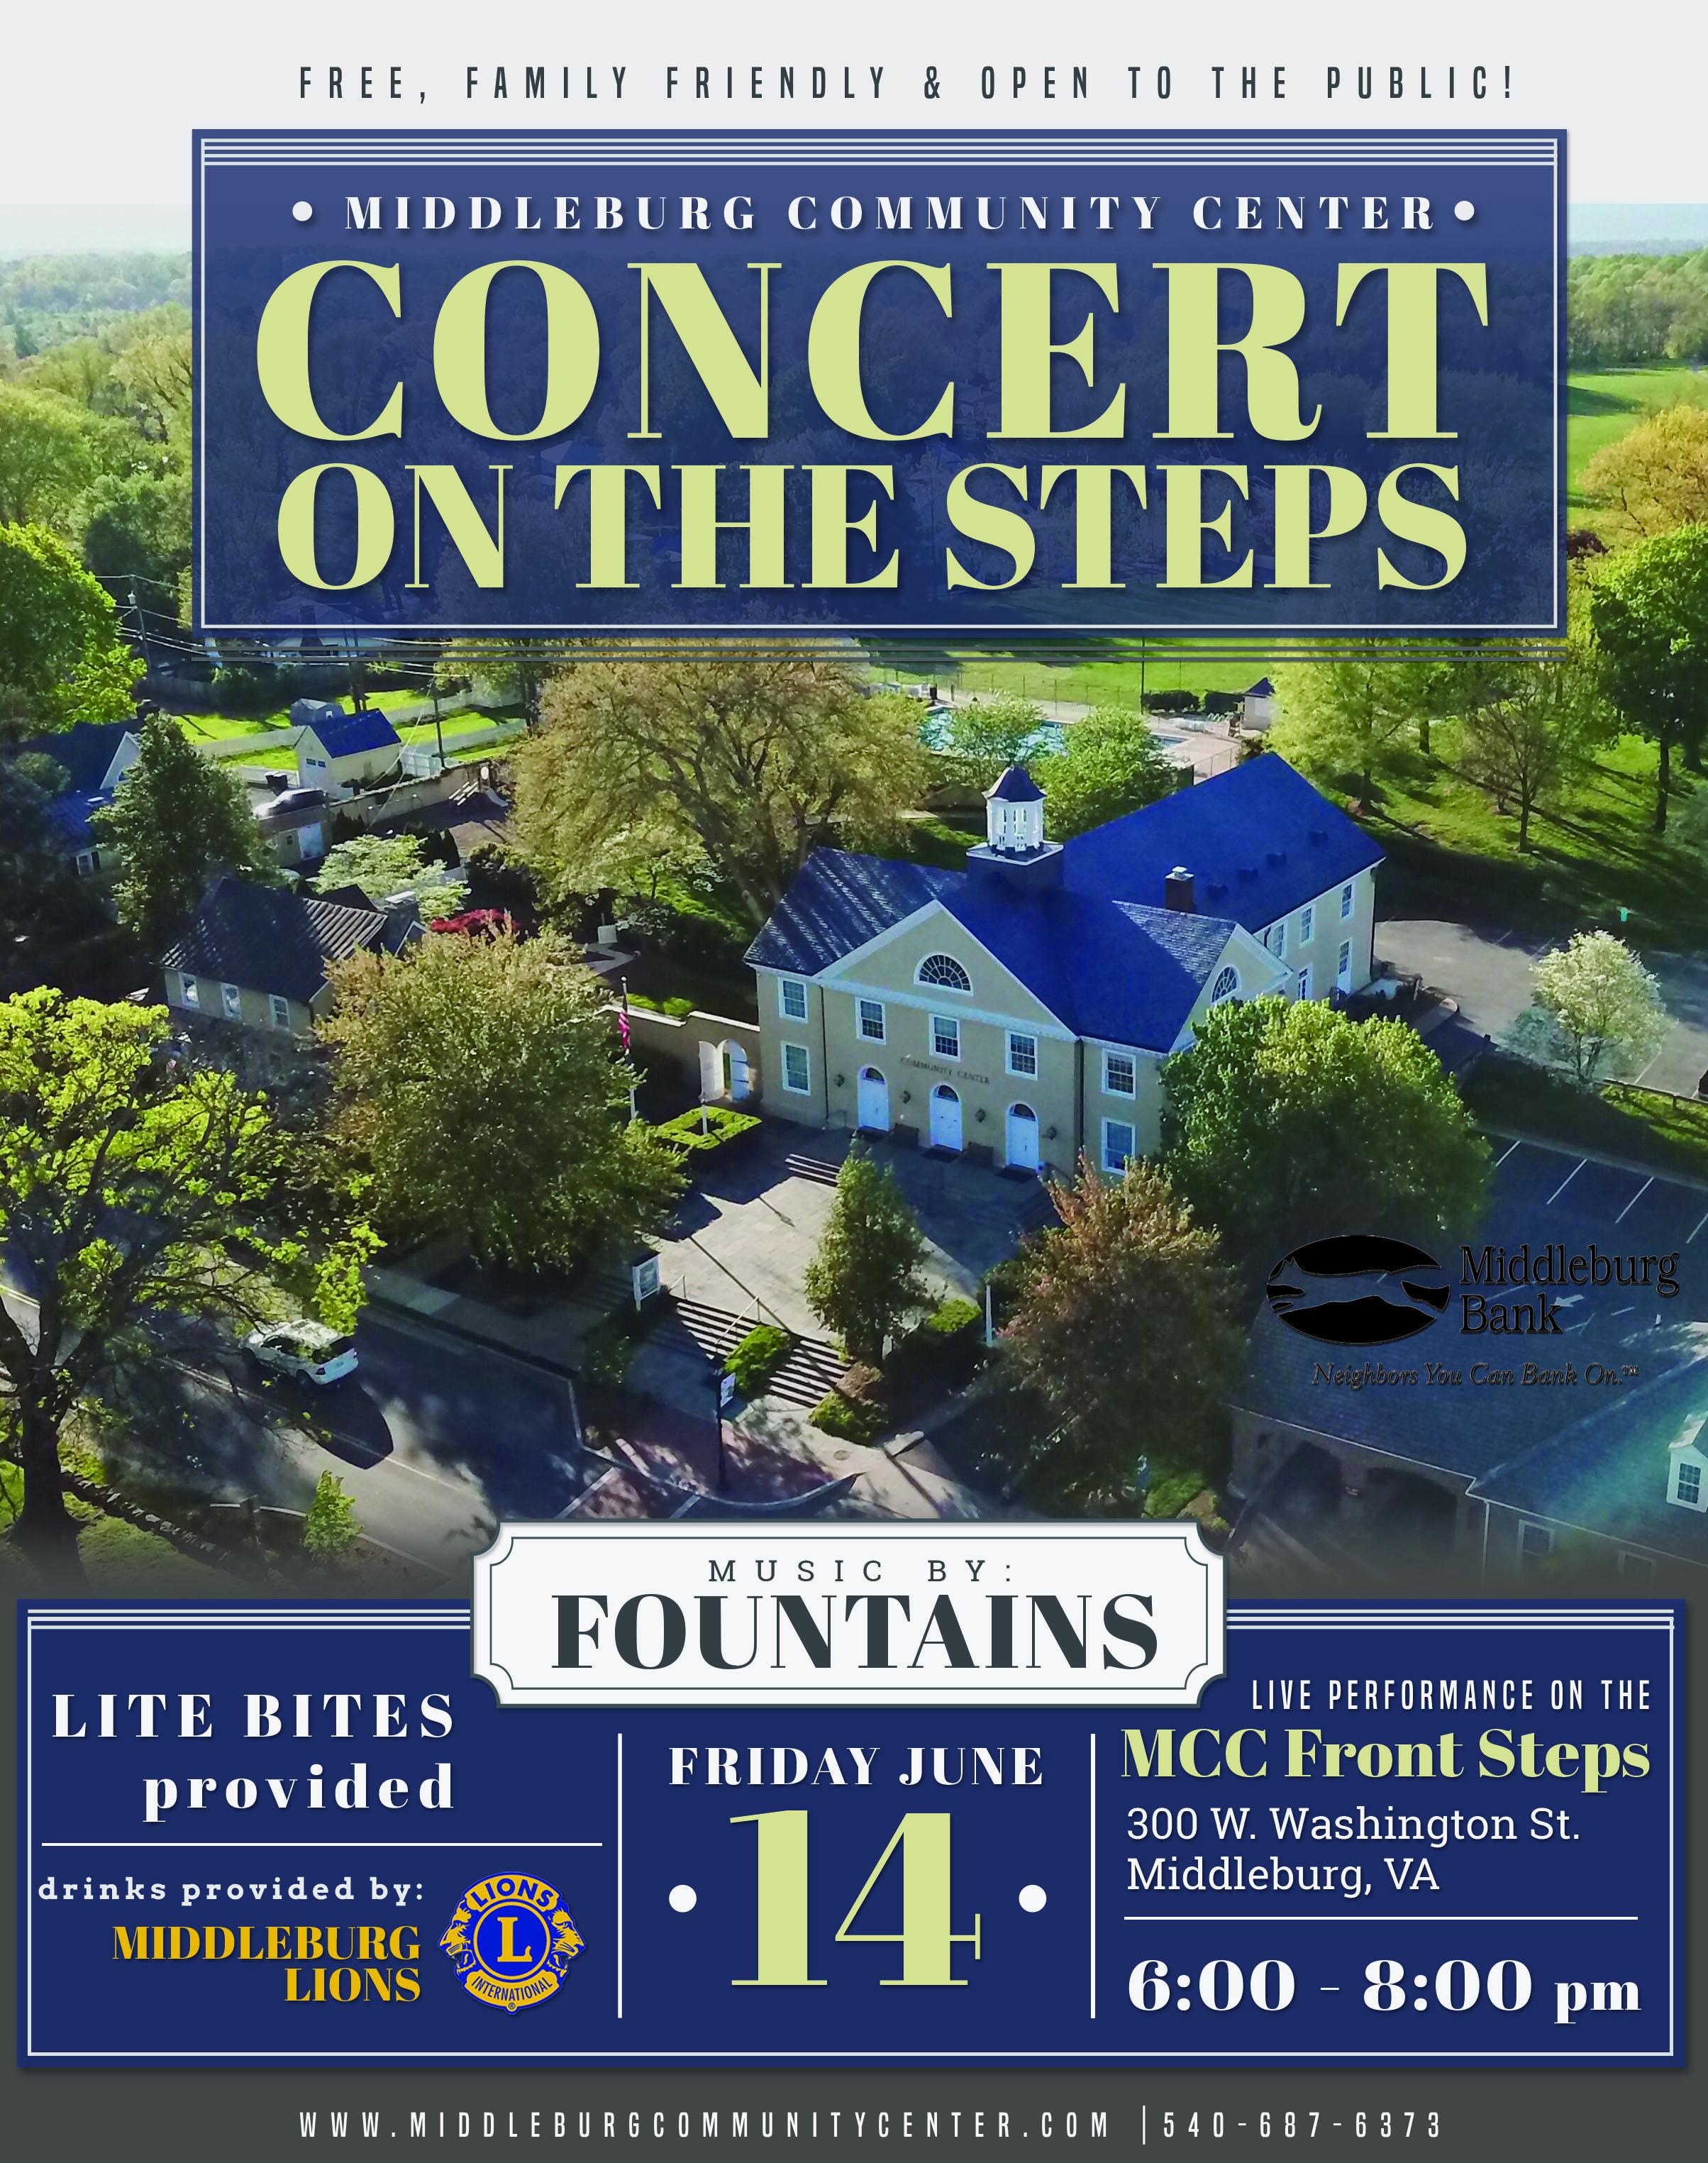 FINALconcert on the steps june flyer.jpg